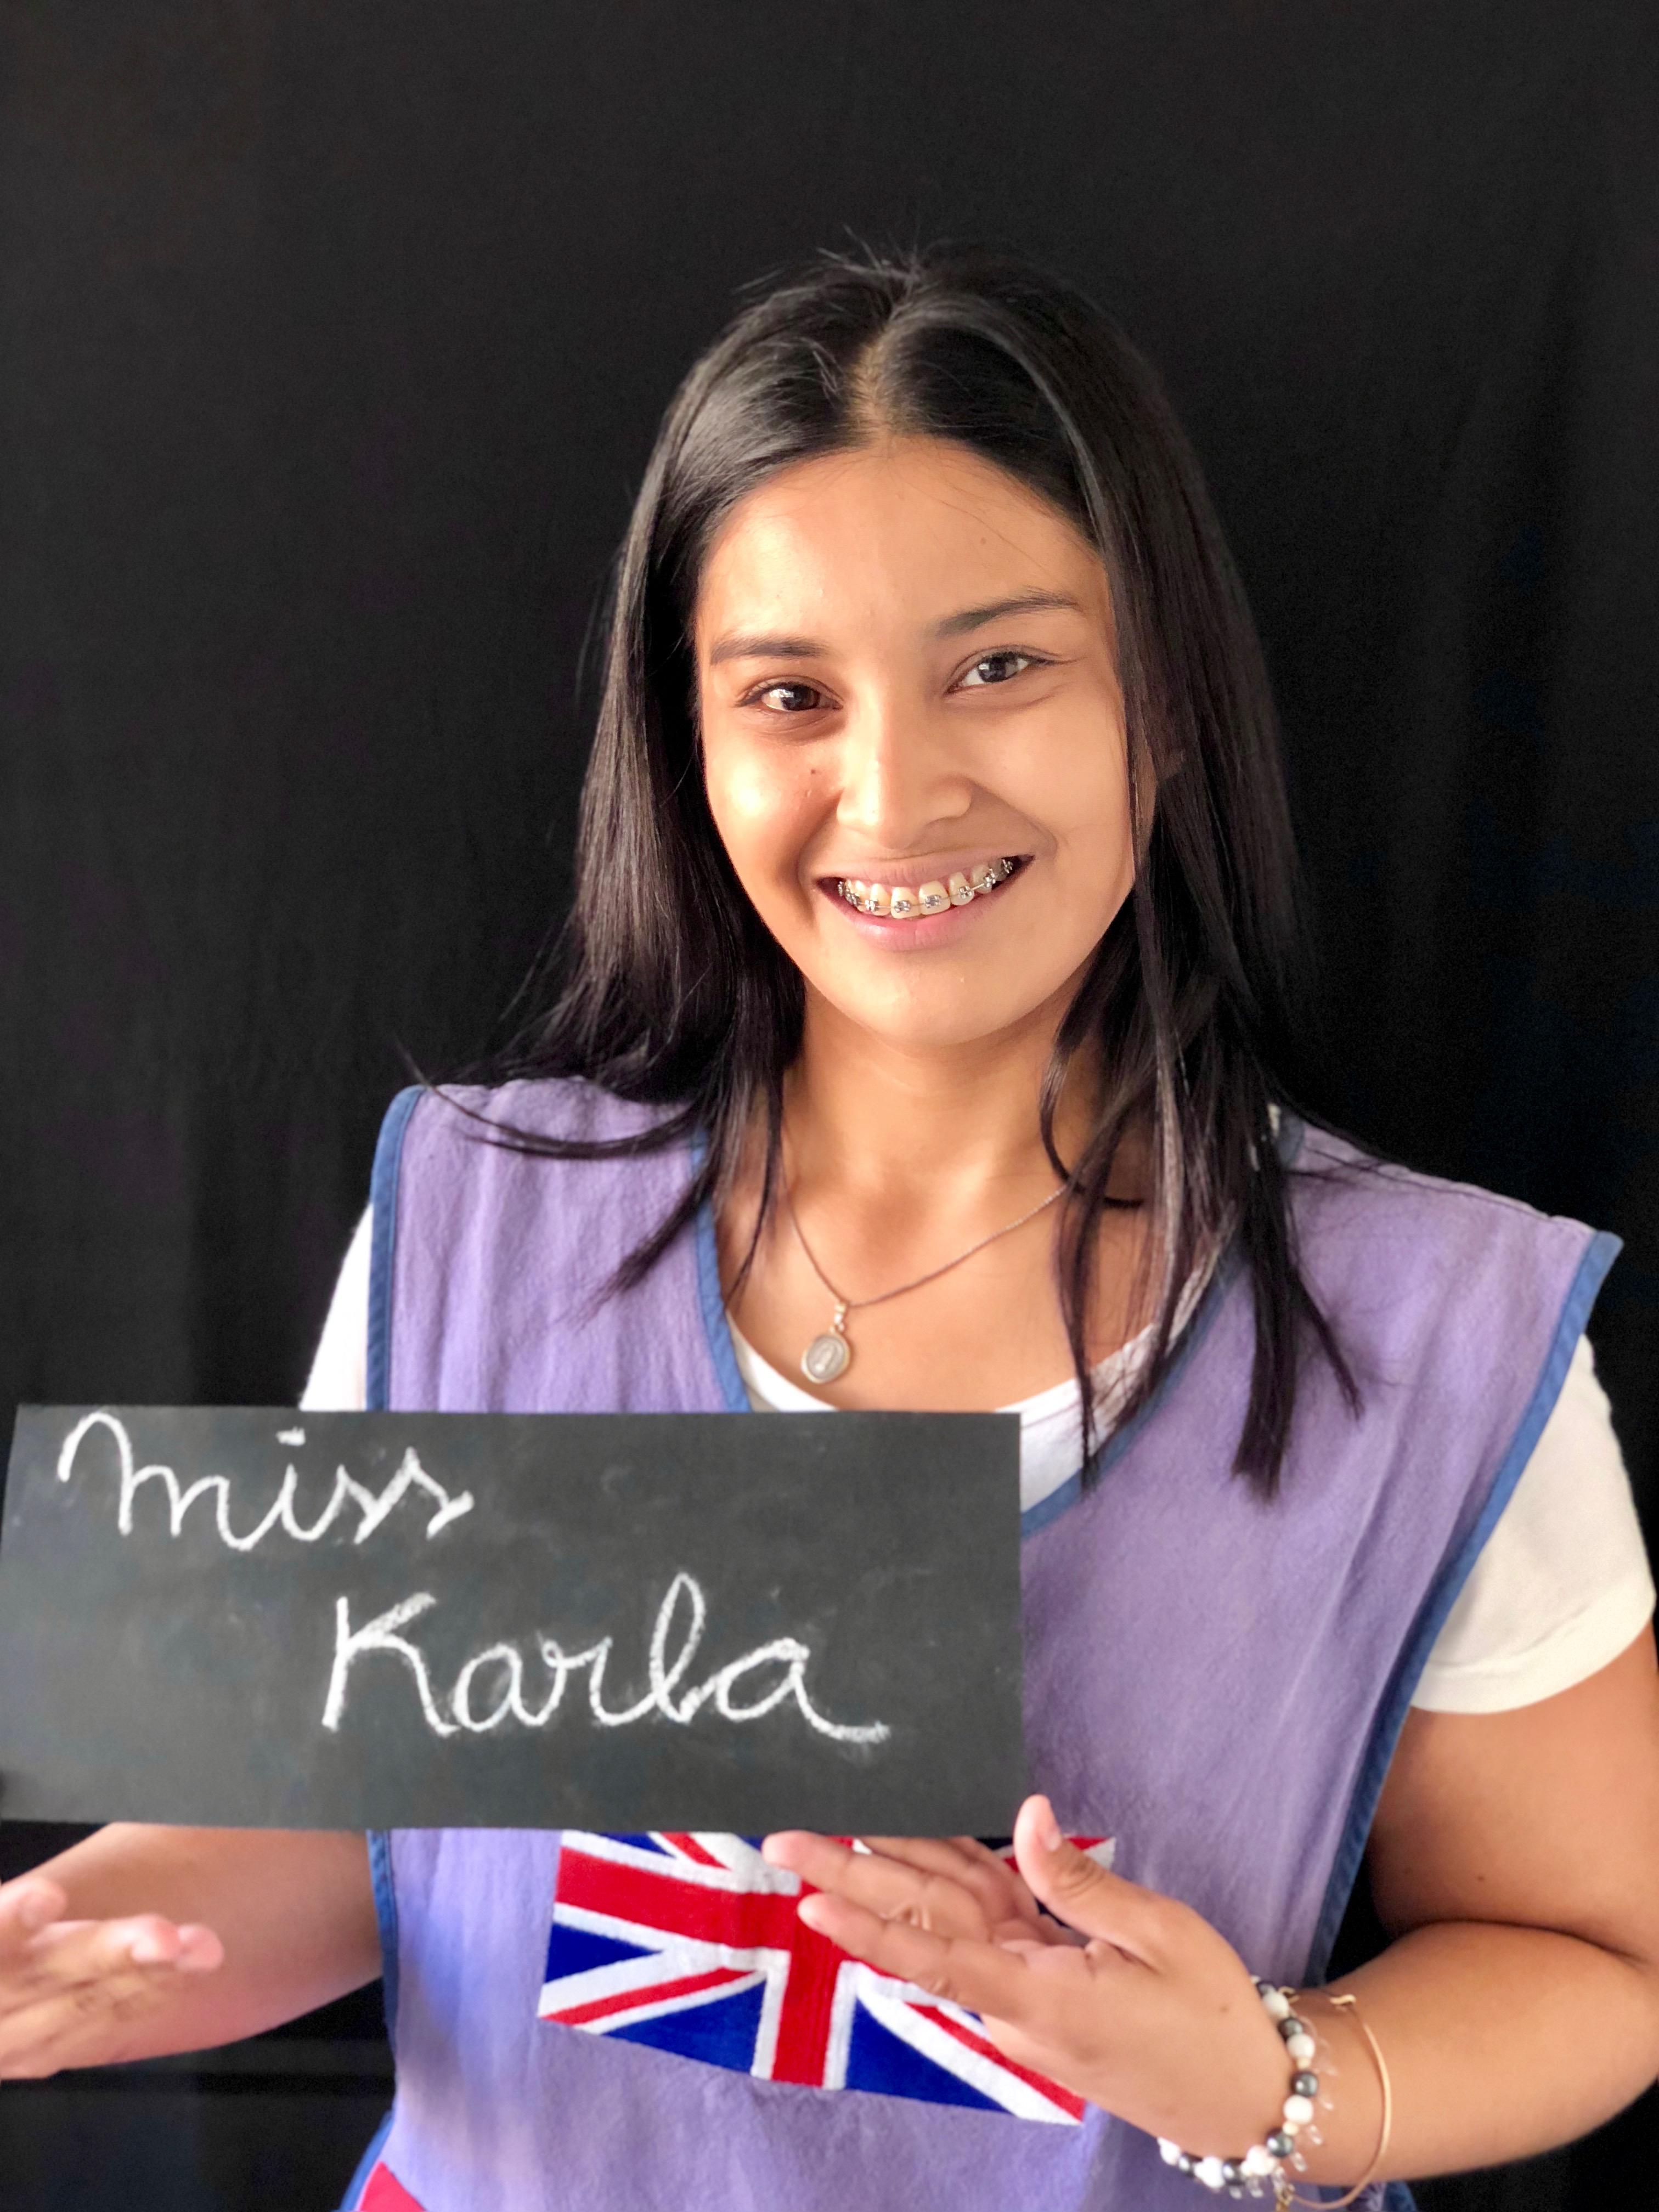 Miss Karla